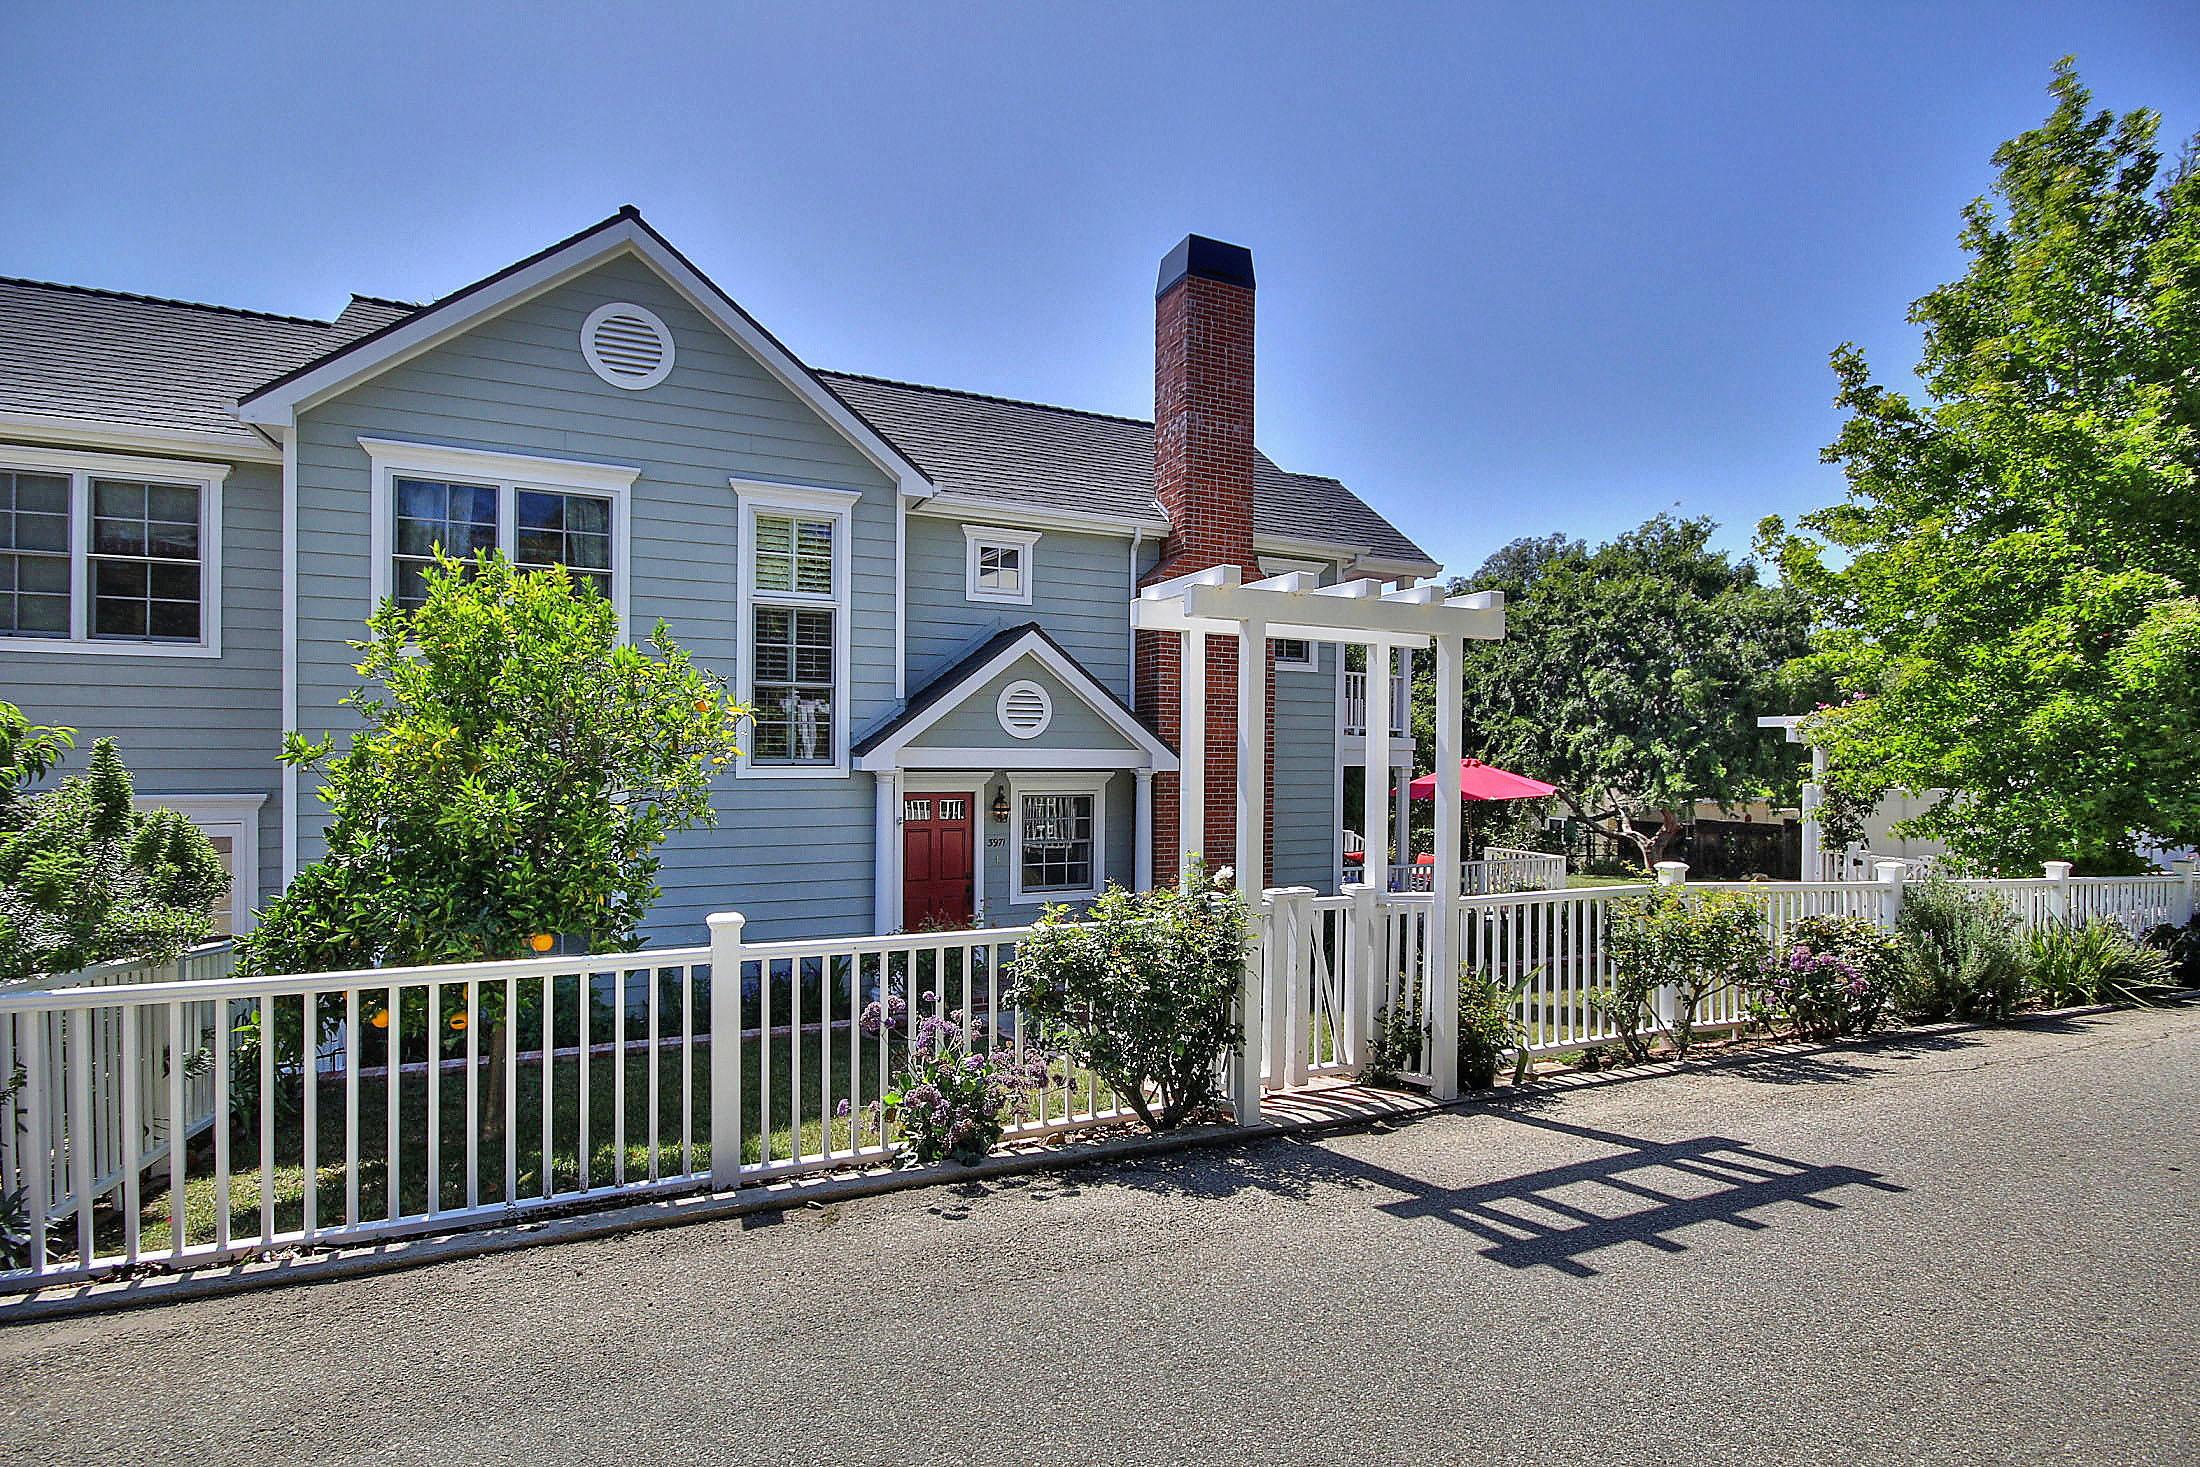 Property photo for 3971 Foothill Rd Santa Barbara, California 93110 - 15-3691